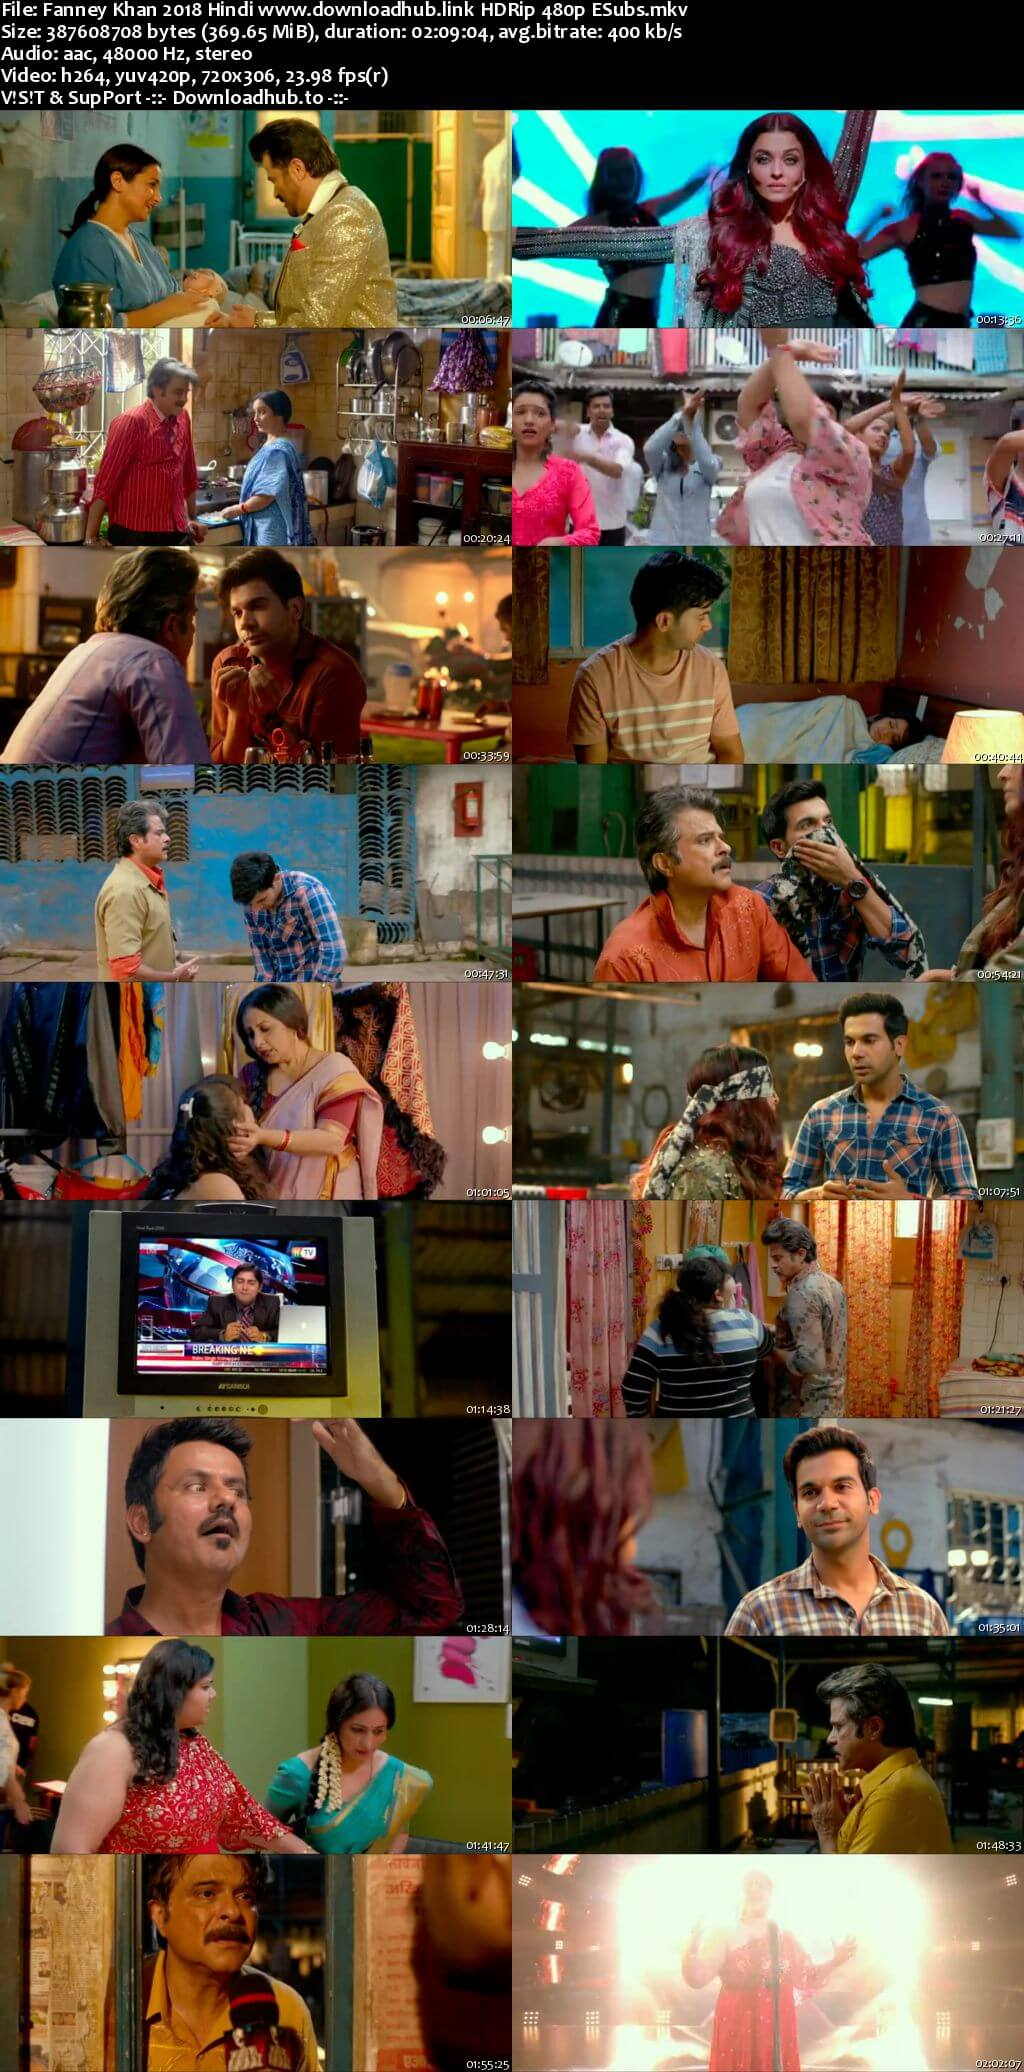 Fanney Khan 2018 Hindi 350MB HDRip 480p ESubs